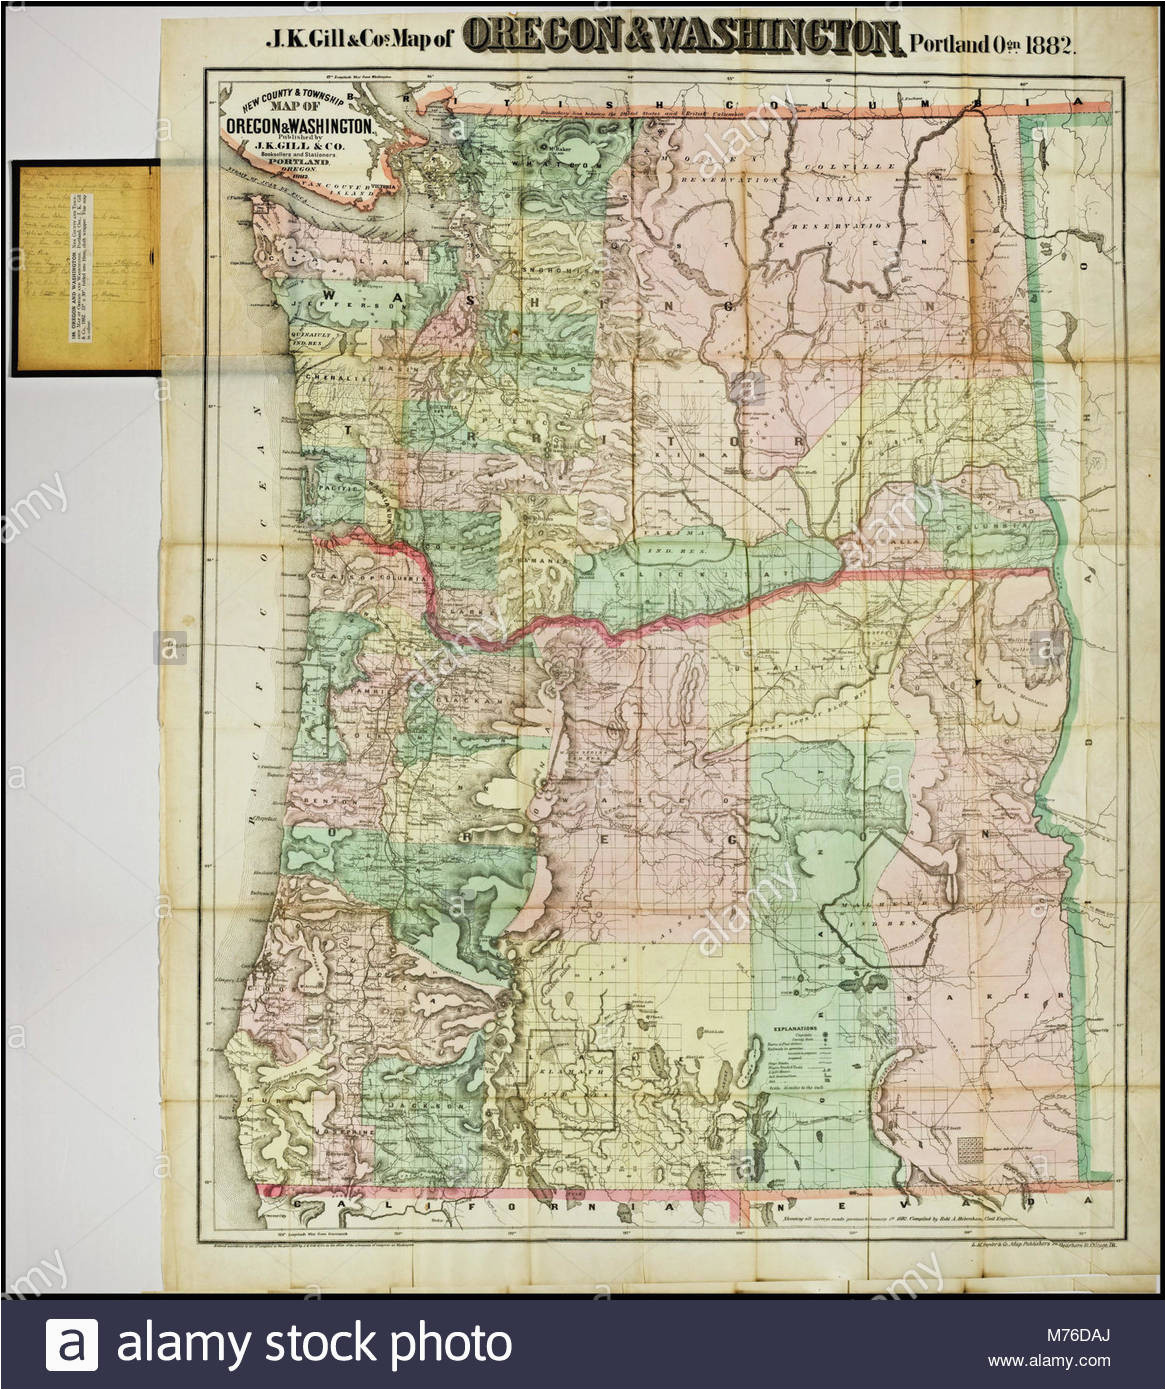 Oregon Township And Range Map Oregon township and Range Map oregon Washington Map Stock Photos